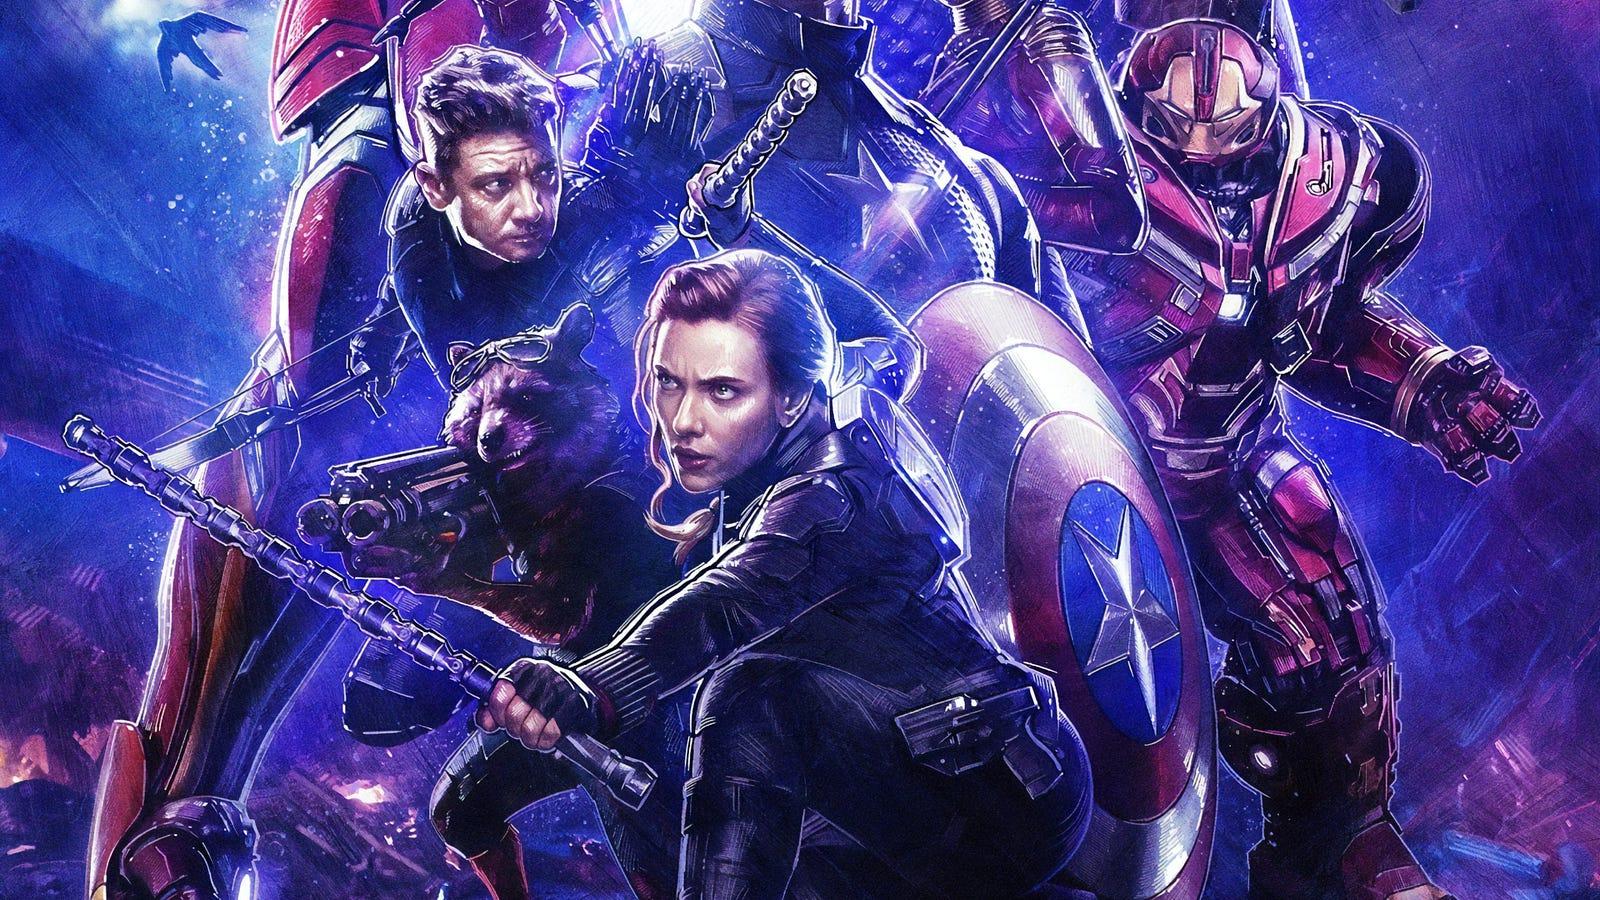 avengers: endgame (2019) streaming vostfr – brian durham – medium